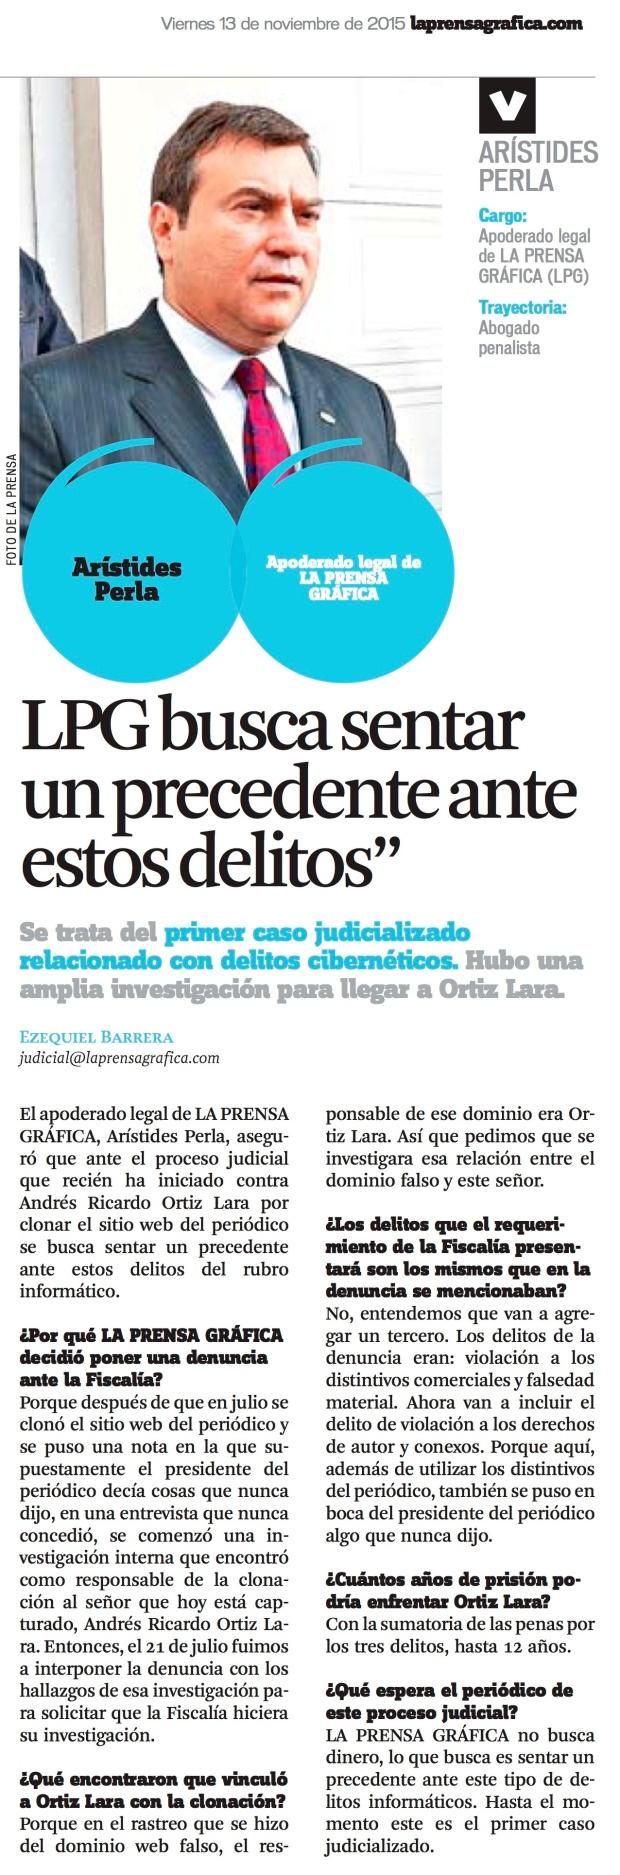 LPG20151113 - La Prensa Gráfica - PORTADA - pag 4